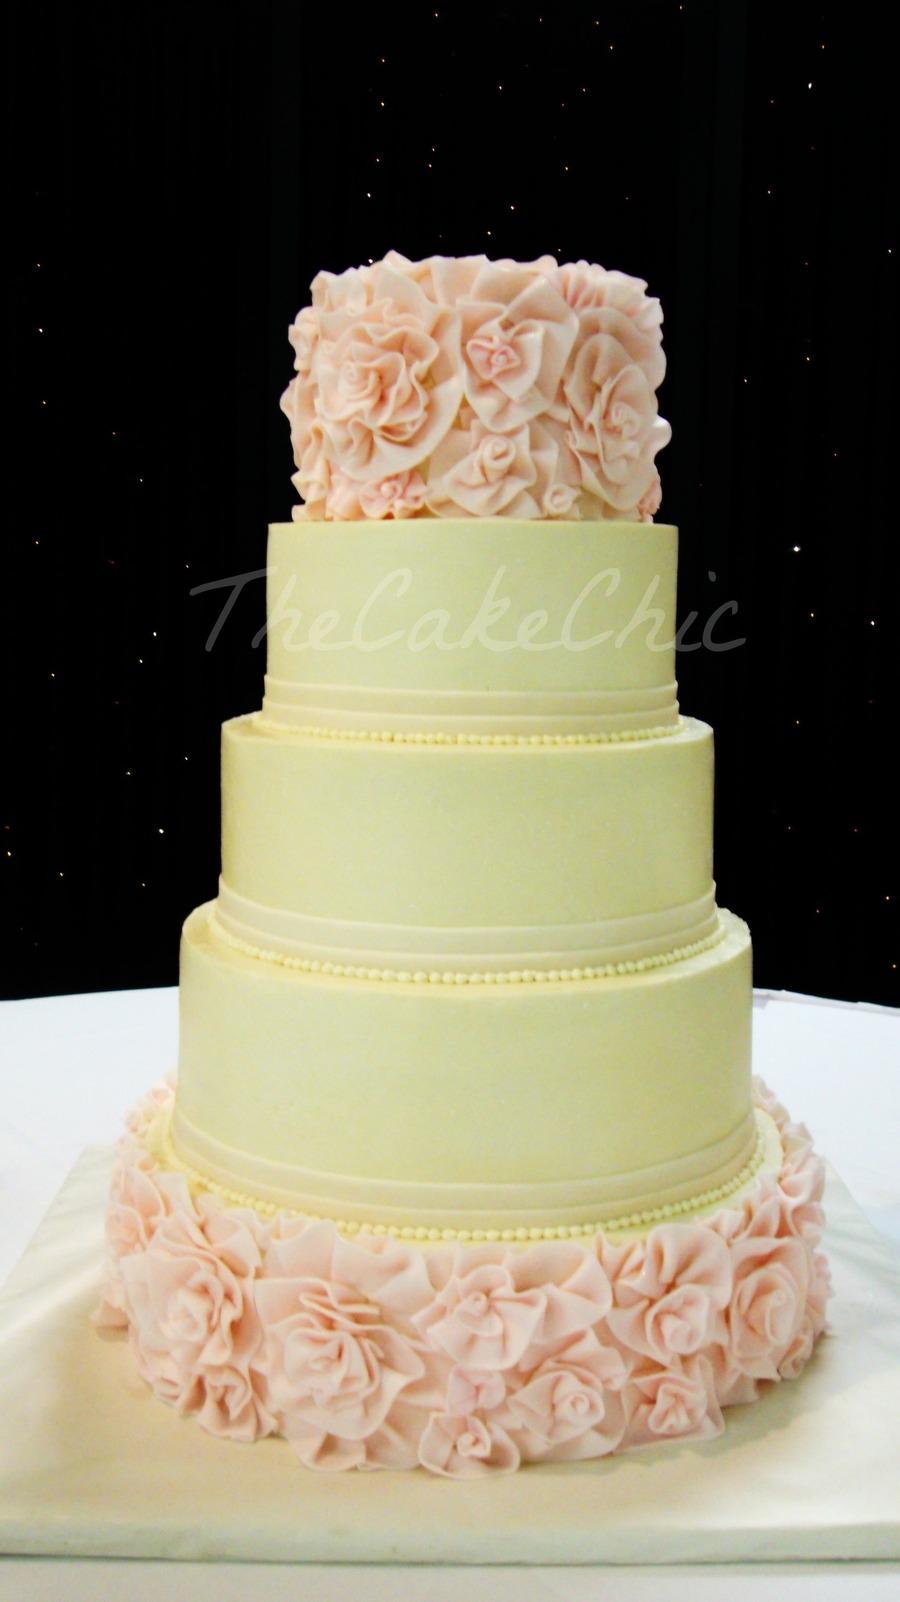 Vanilla Cream Filling For Wedding Cake